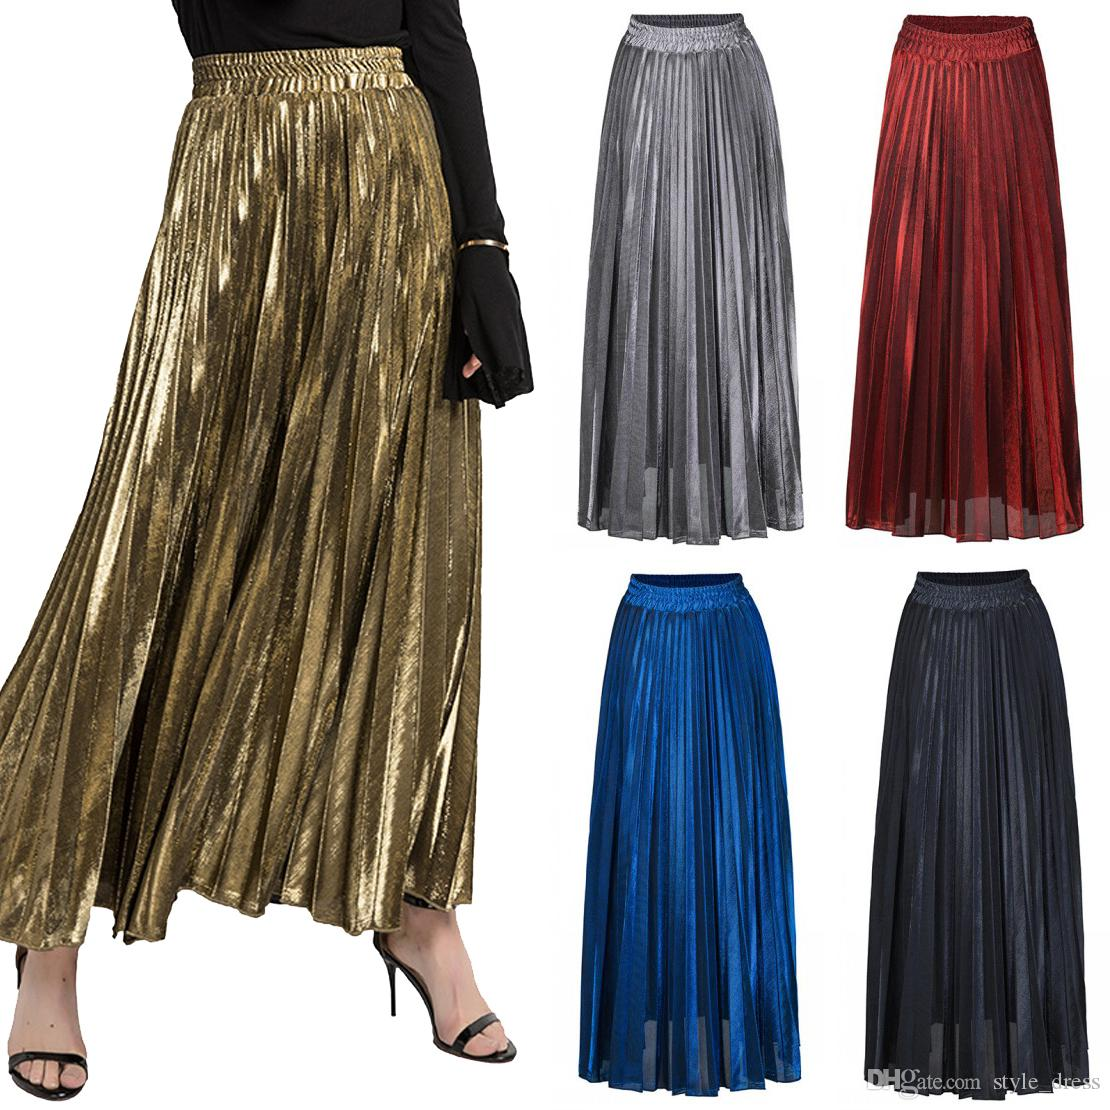 3d7ad3cc4 Falda larga plisada metálica de las mujeres falda maxi de la cintura alta  del tobillo ocasional